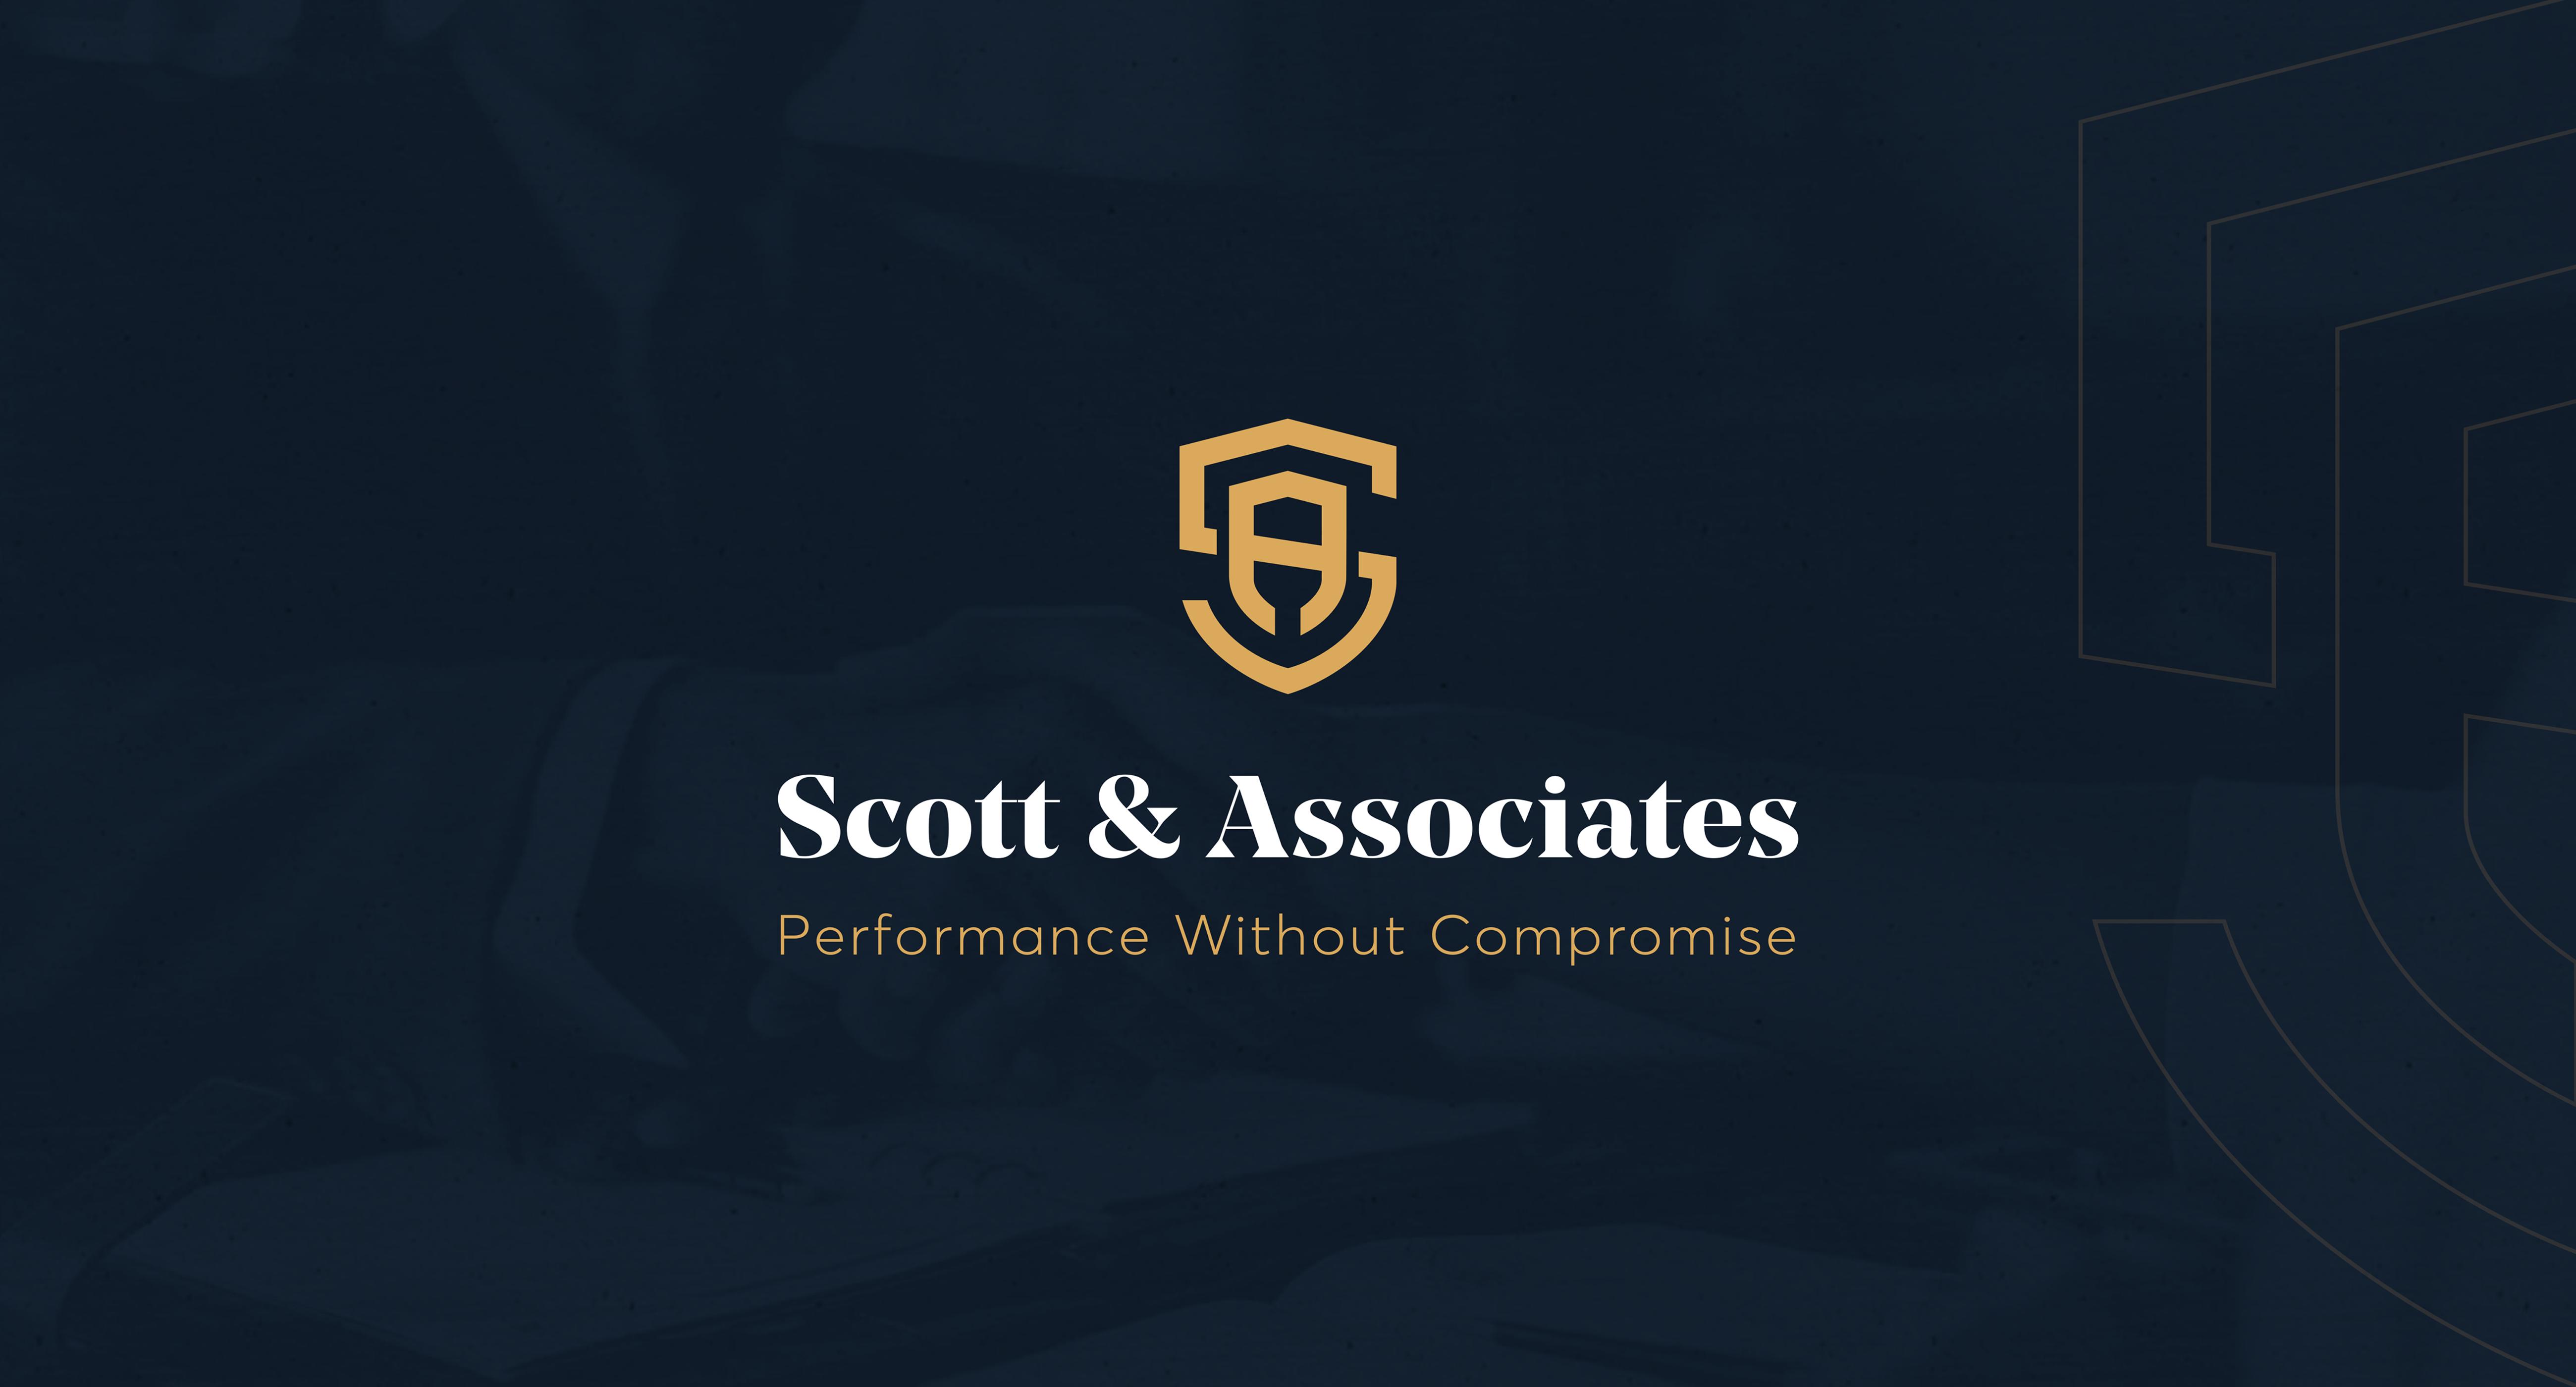 Scott & Associates